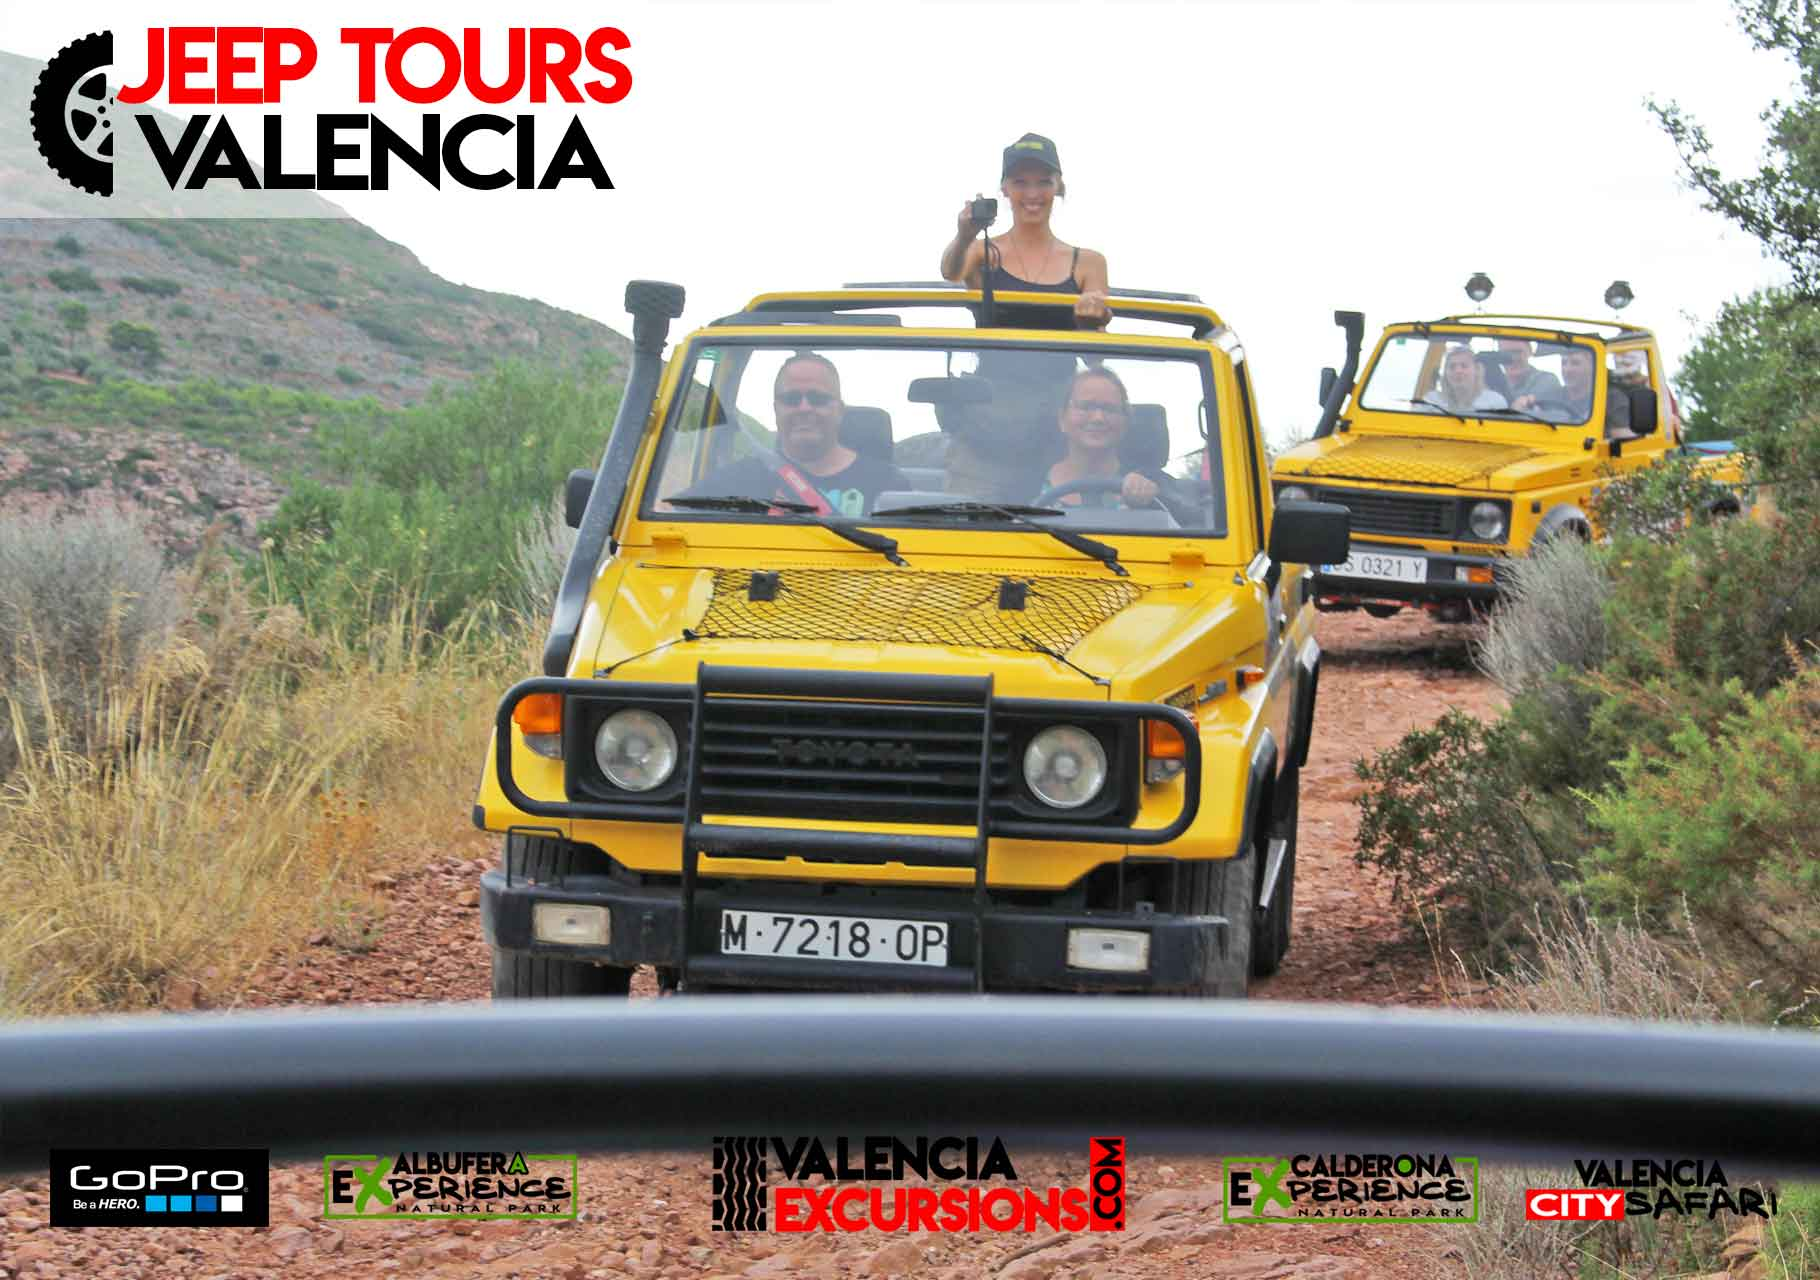 Jeep Tour Valencia Hinterland. Abenteuertour in die Berge Claderona El Garbi . Sehenswürdigkeiten Valencia Tour